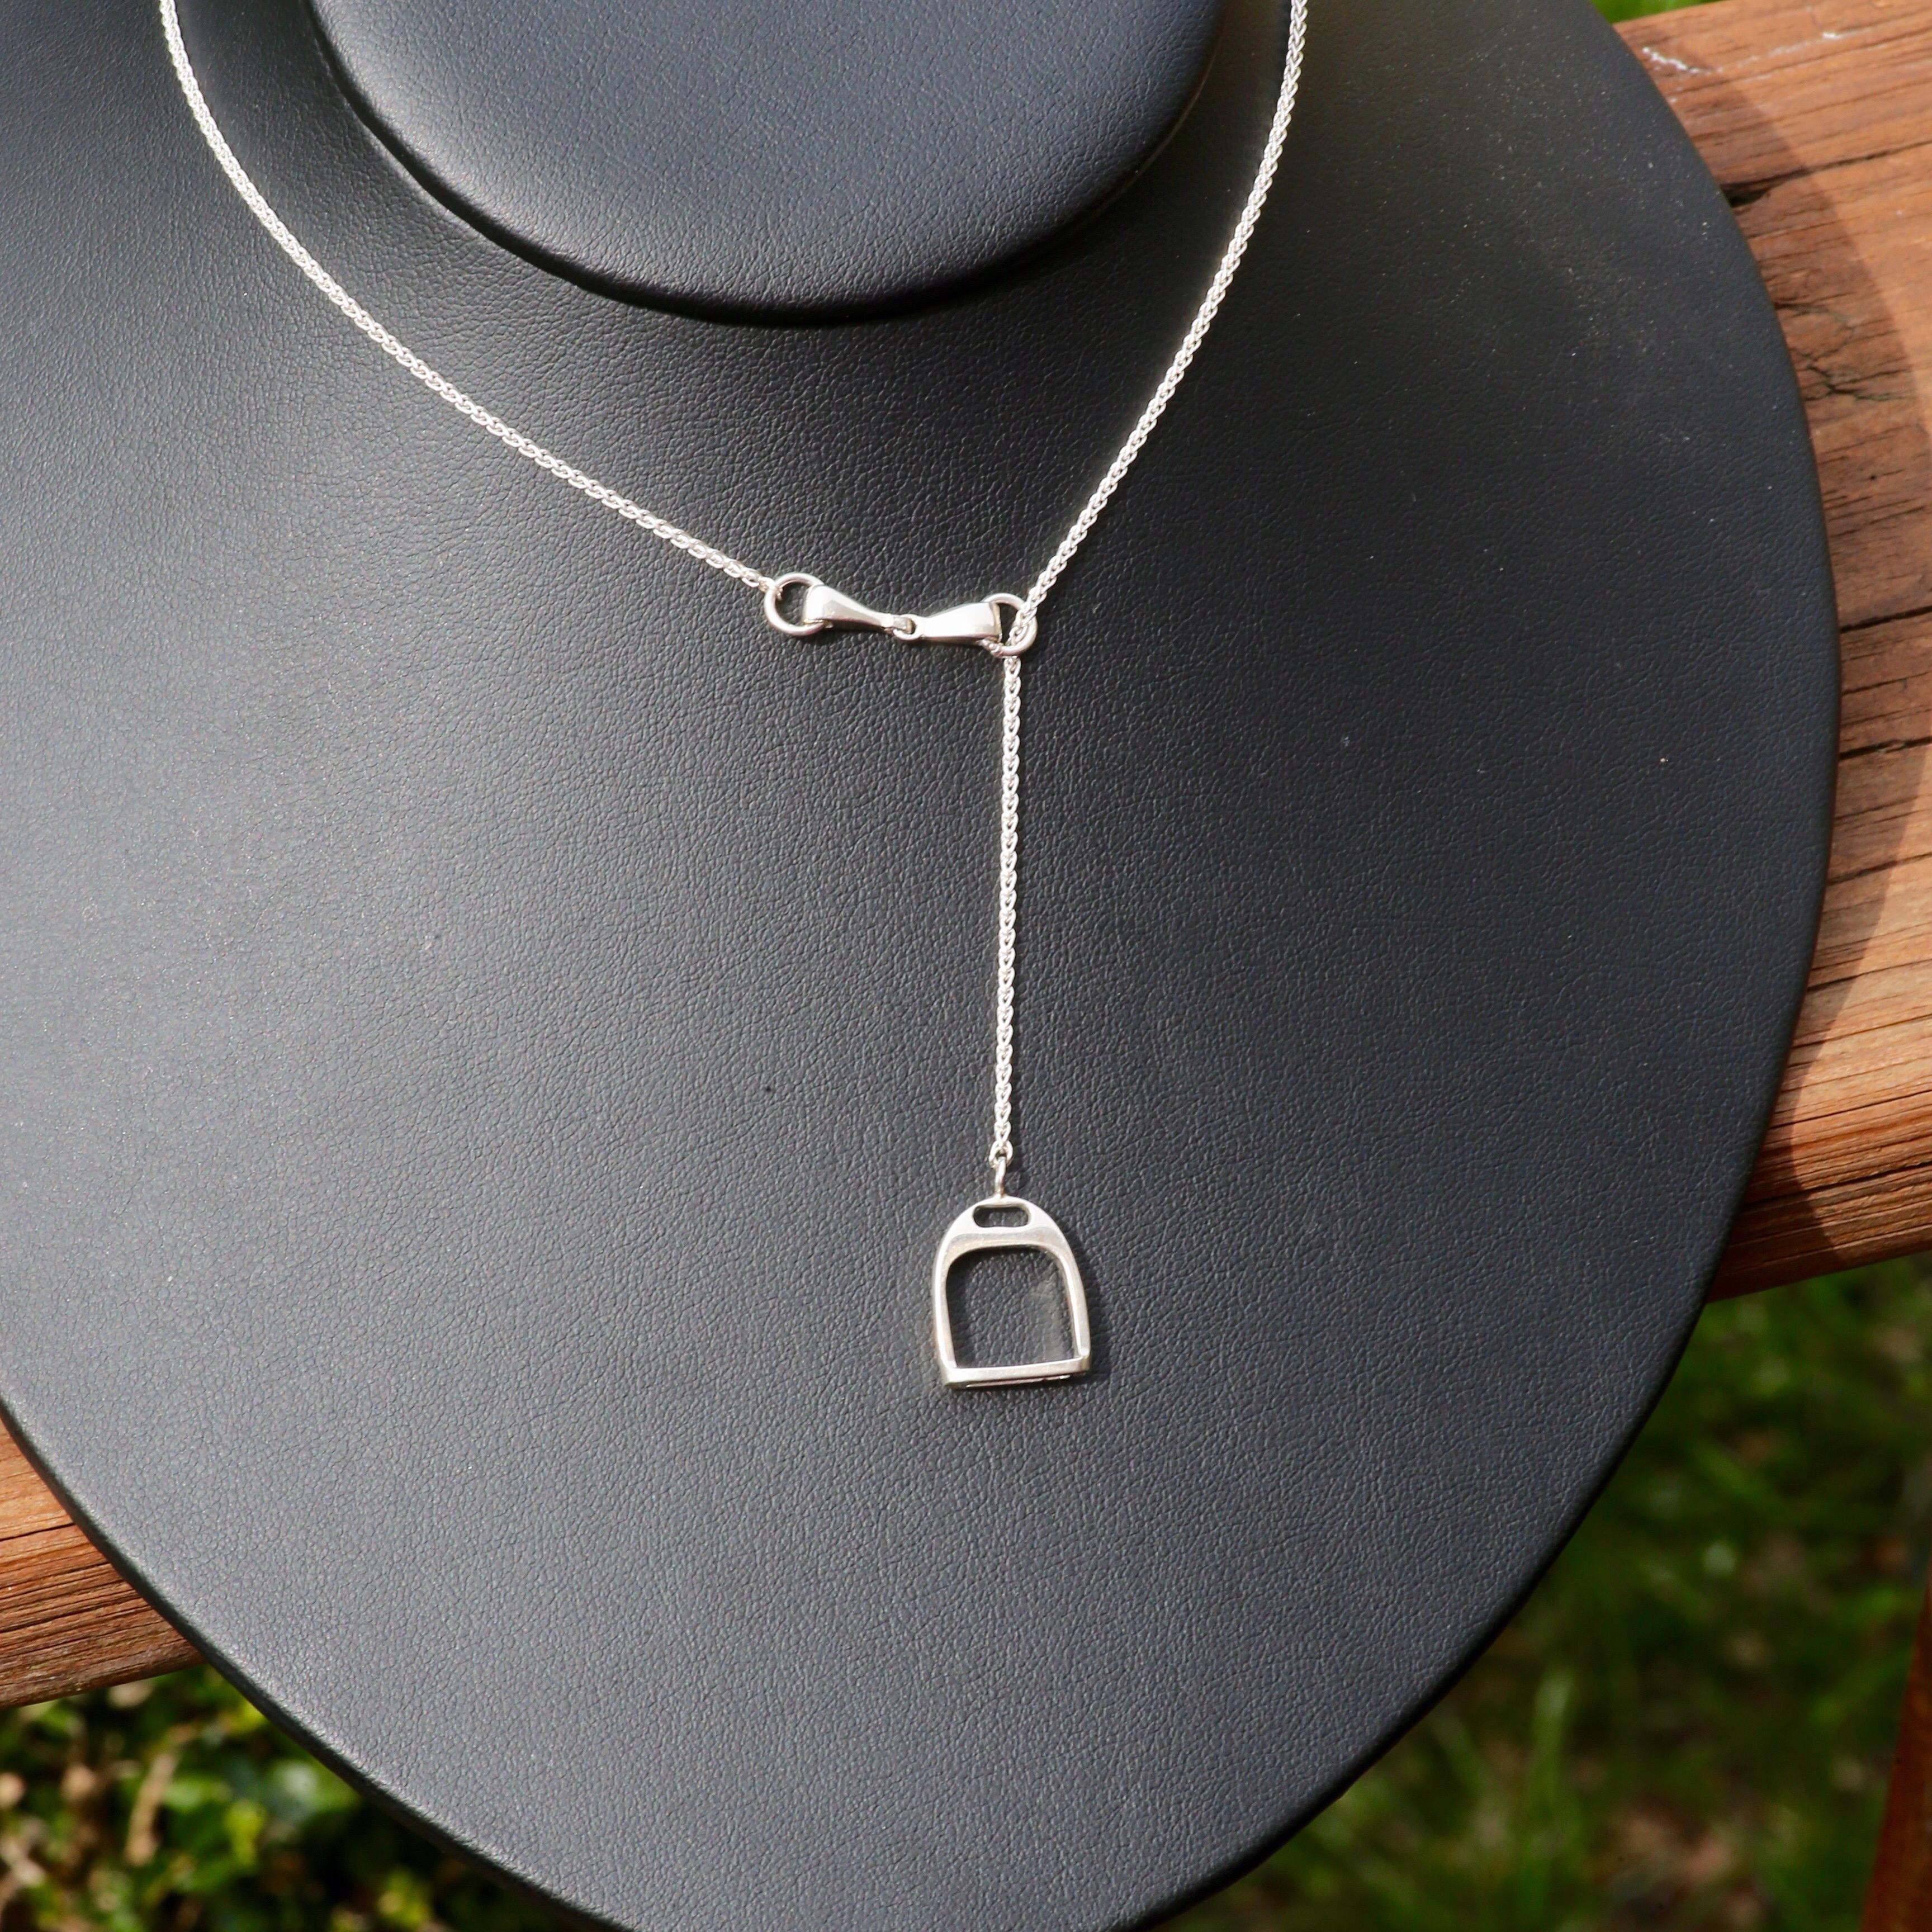 Silver Equestrian Necklace